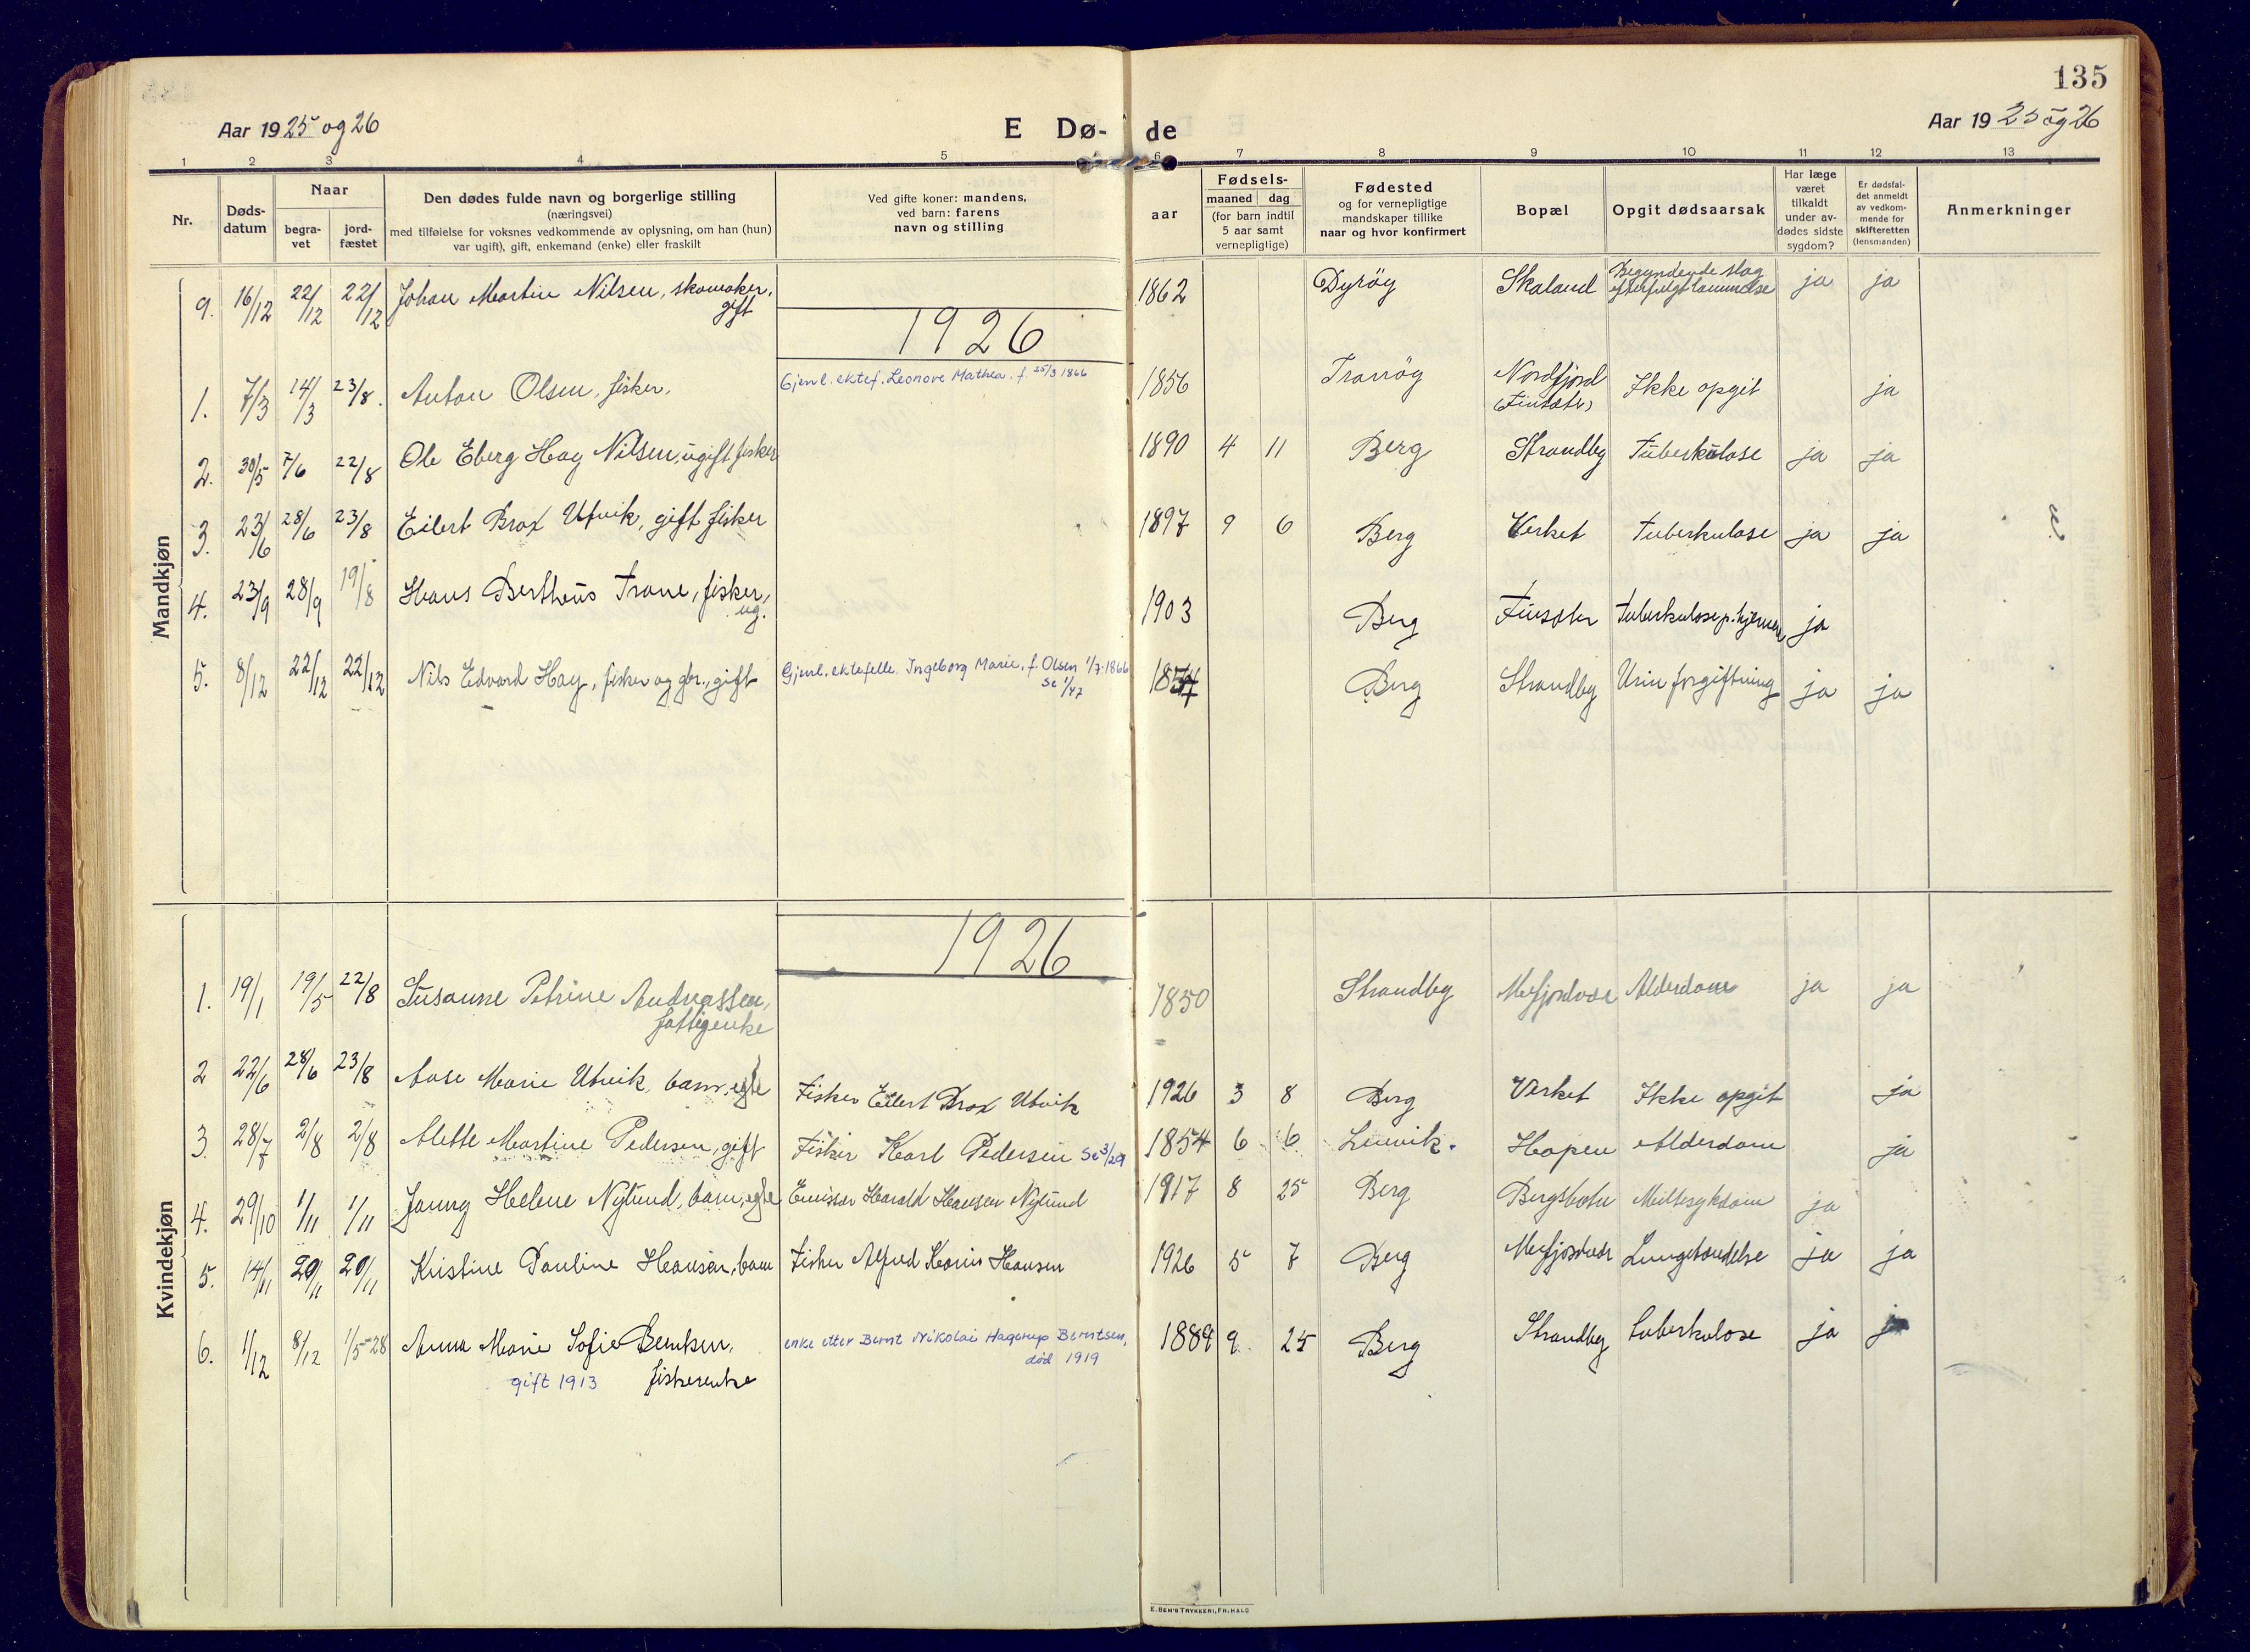 SATØ, Mefjord/Berg sokneprestkontor, G/Ga/Gaa: Ministerialbok nr. 9, 1916-1928, s. 135